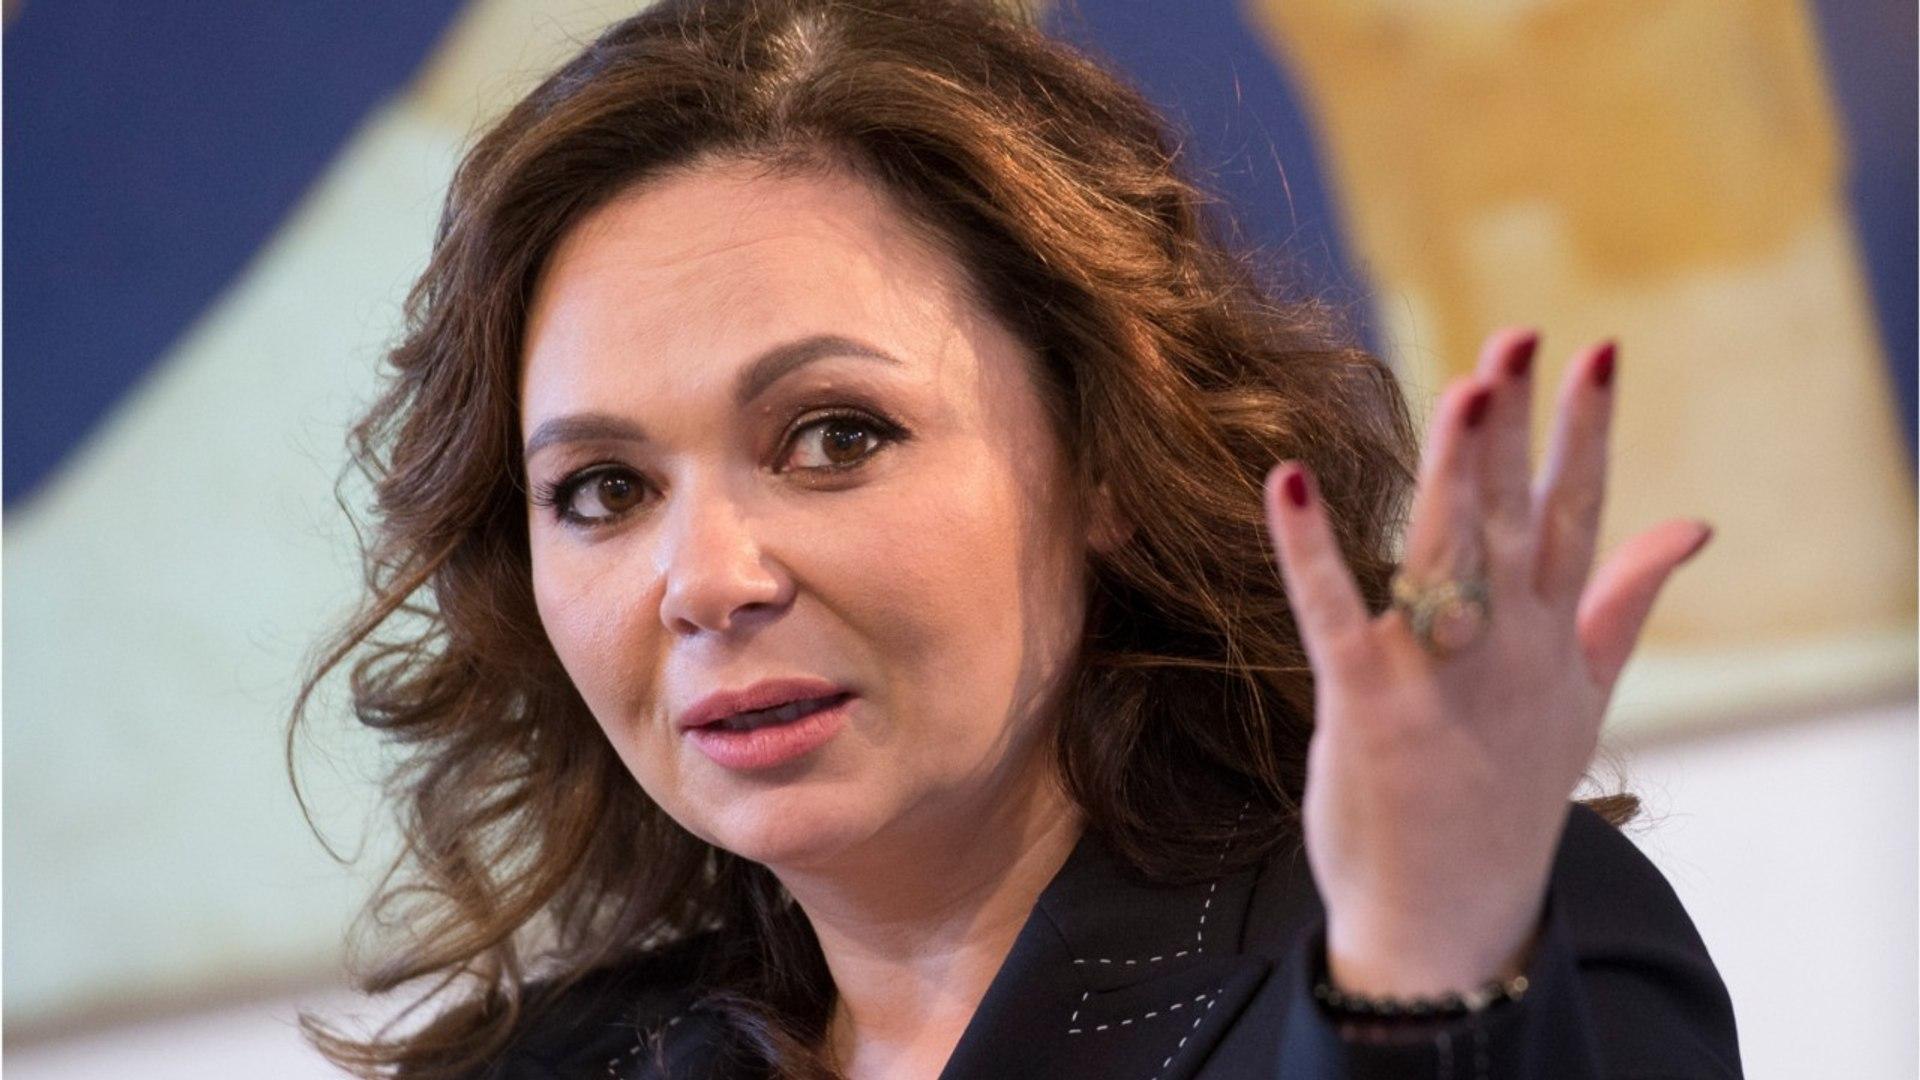 Trump Leaks Russian Lawyer Secrets From Trump Tower Meeting